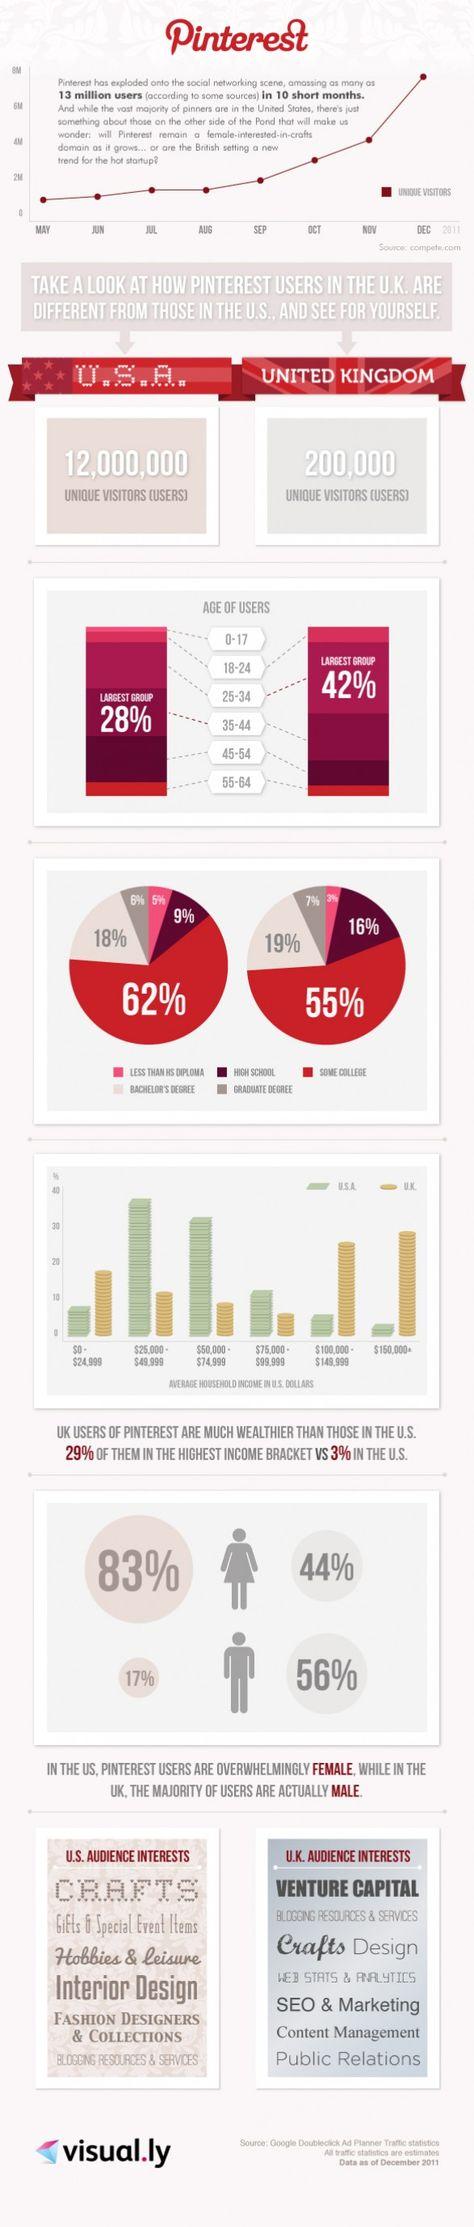 Pinterest: USA vs UK